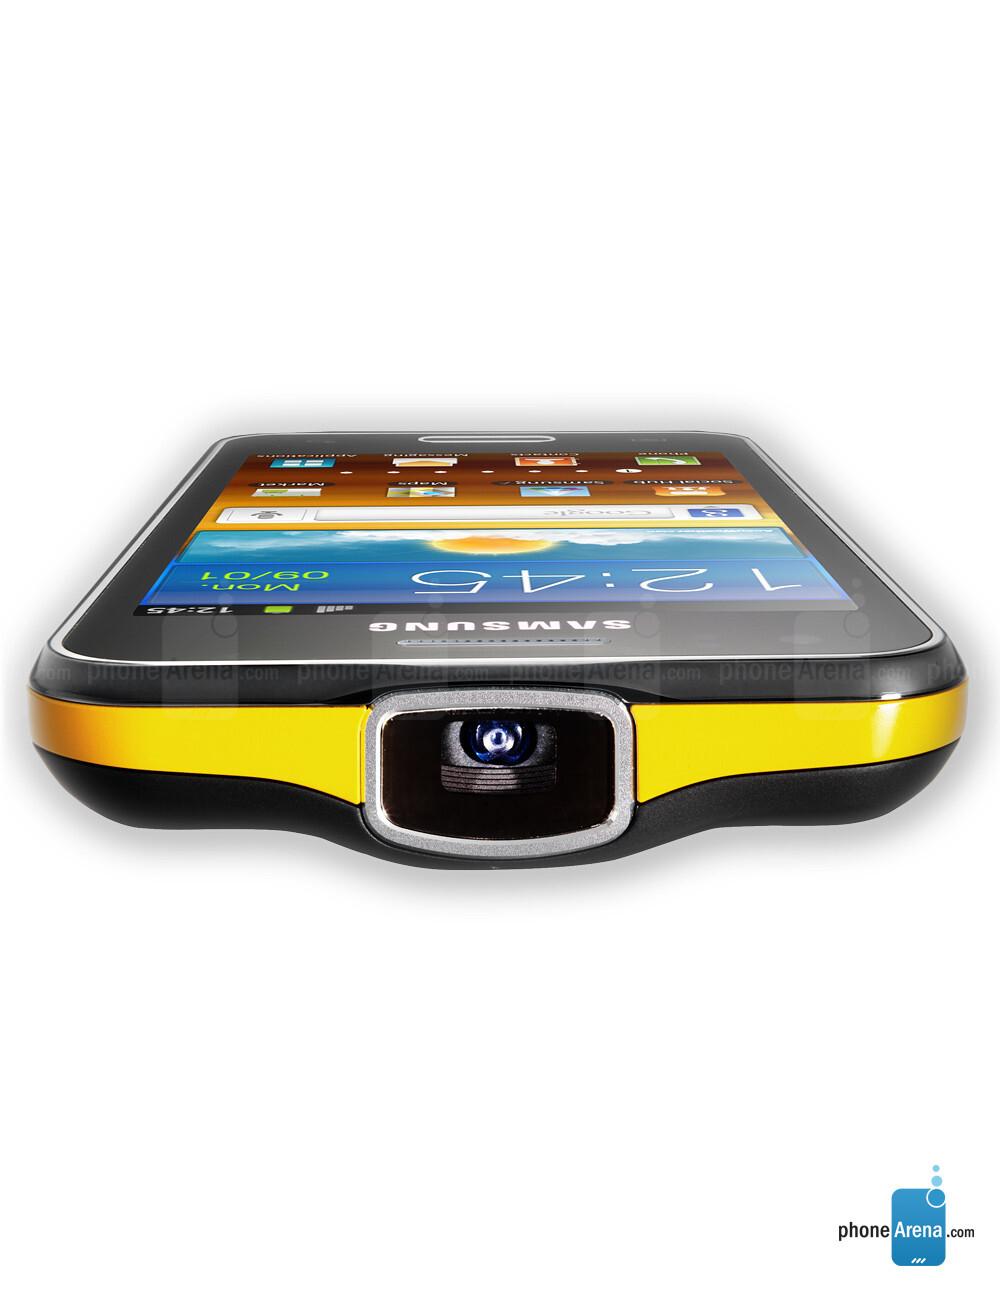 Samsung galaxy beam specs for Samsung beam tv